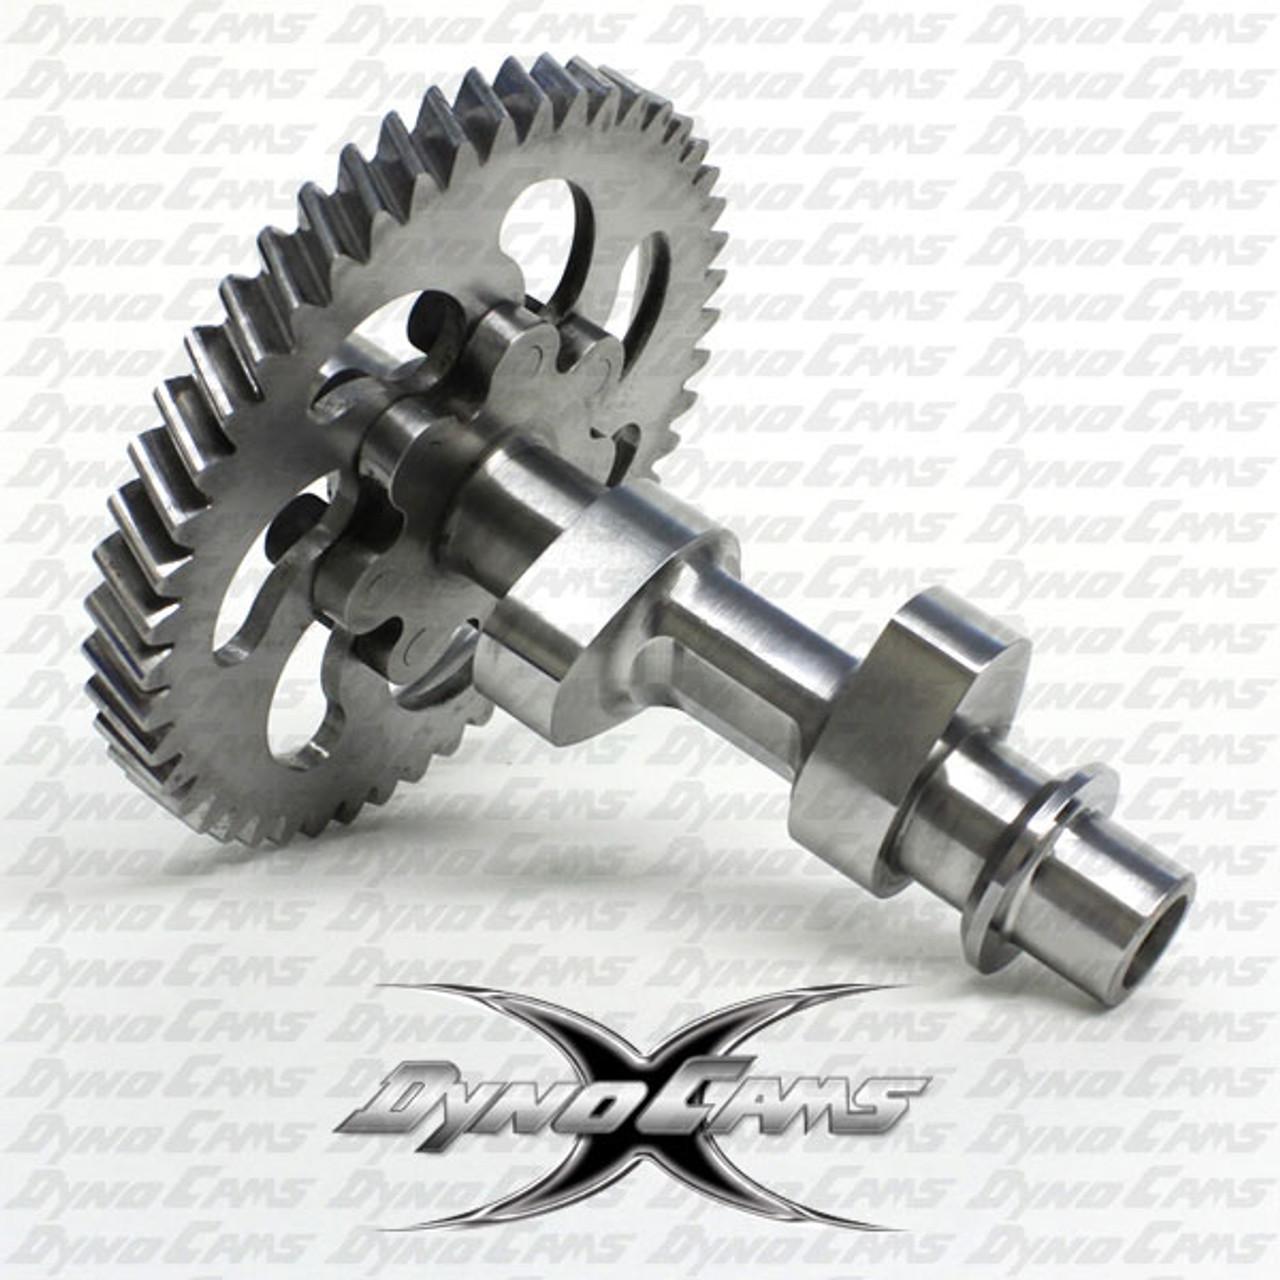 310 Grind, Tool Steel Billet GX200 196cc Clone Predator 212 Hemi